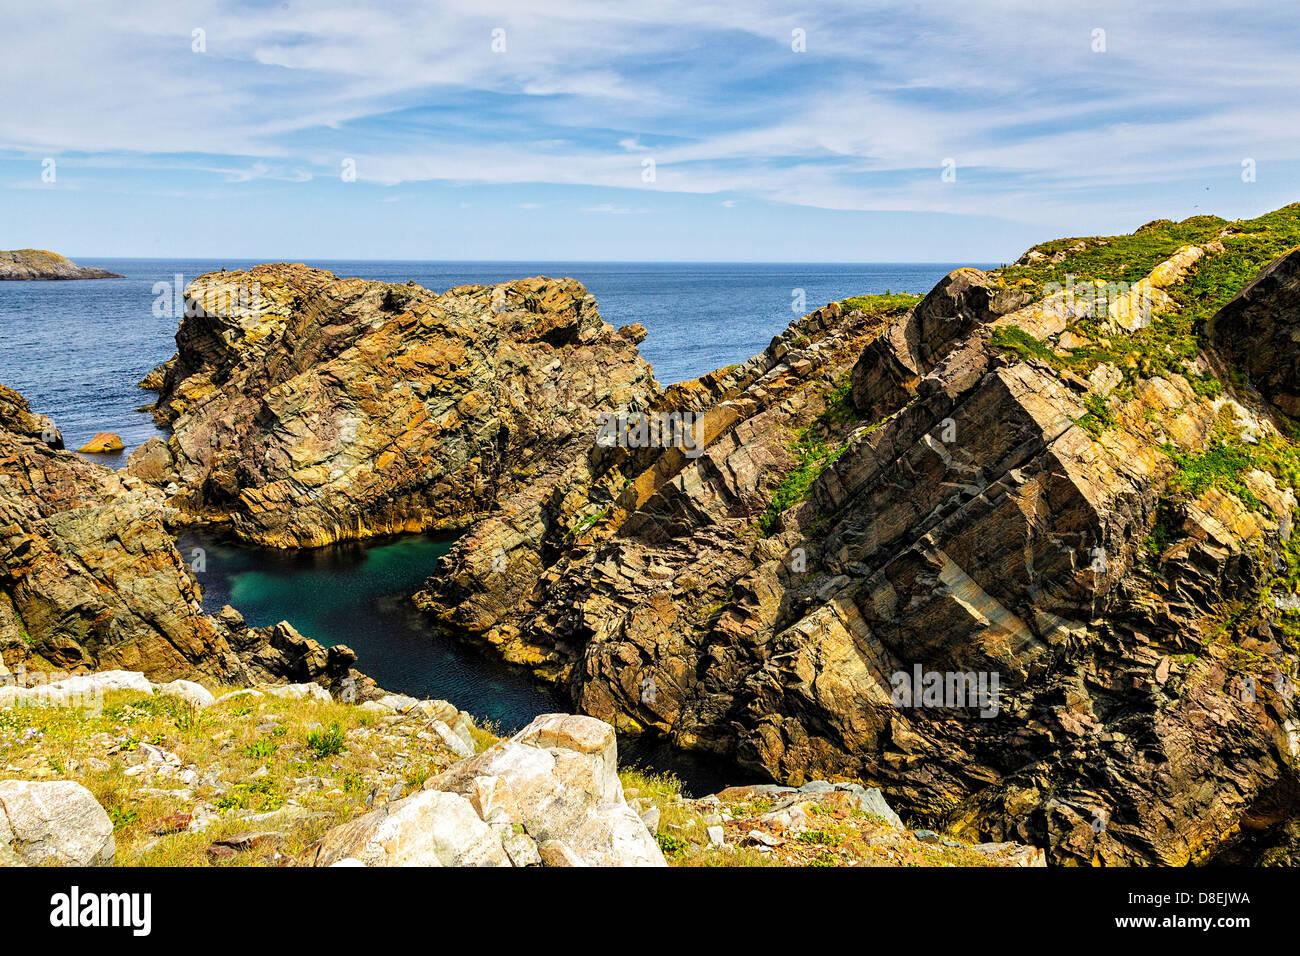 Dramatic and Rugged Landscape in Cape Bonavista, Newfoundland - Stock Image